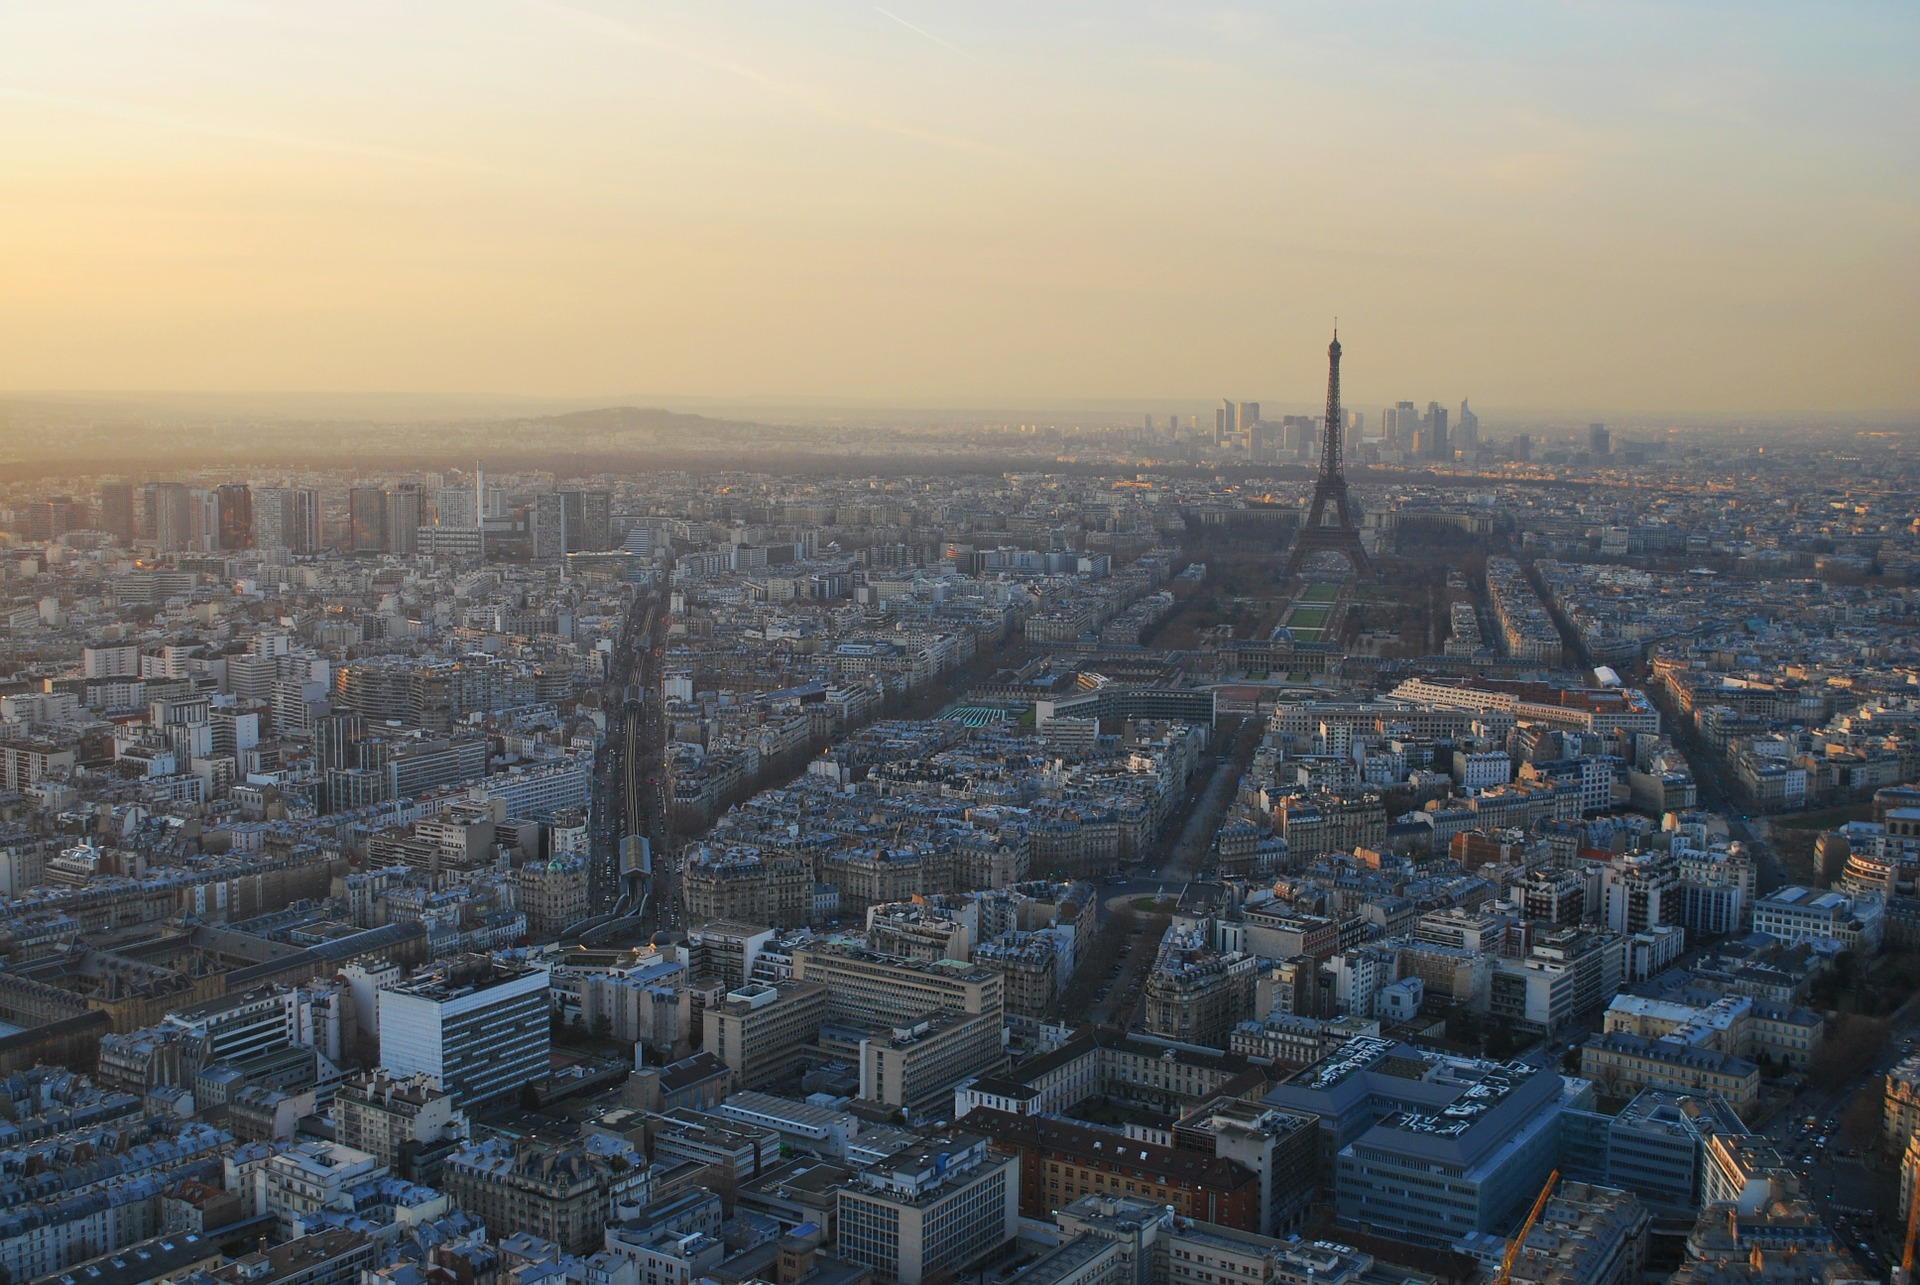 Ein Panorama-Blick über Paris